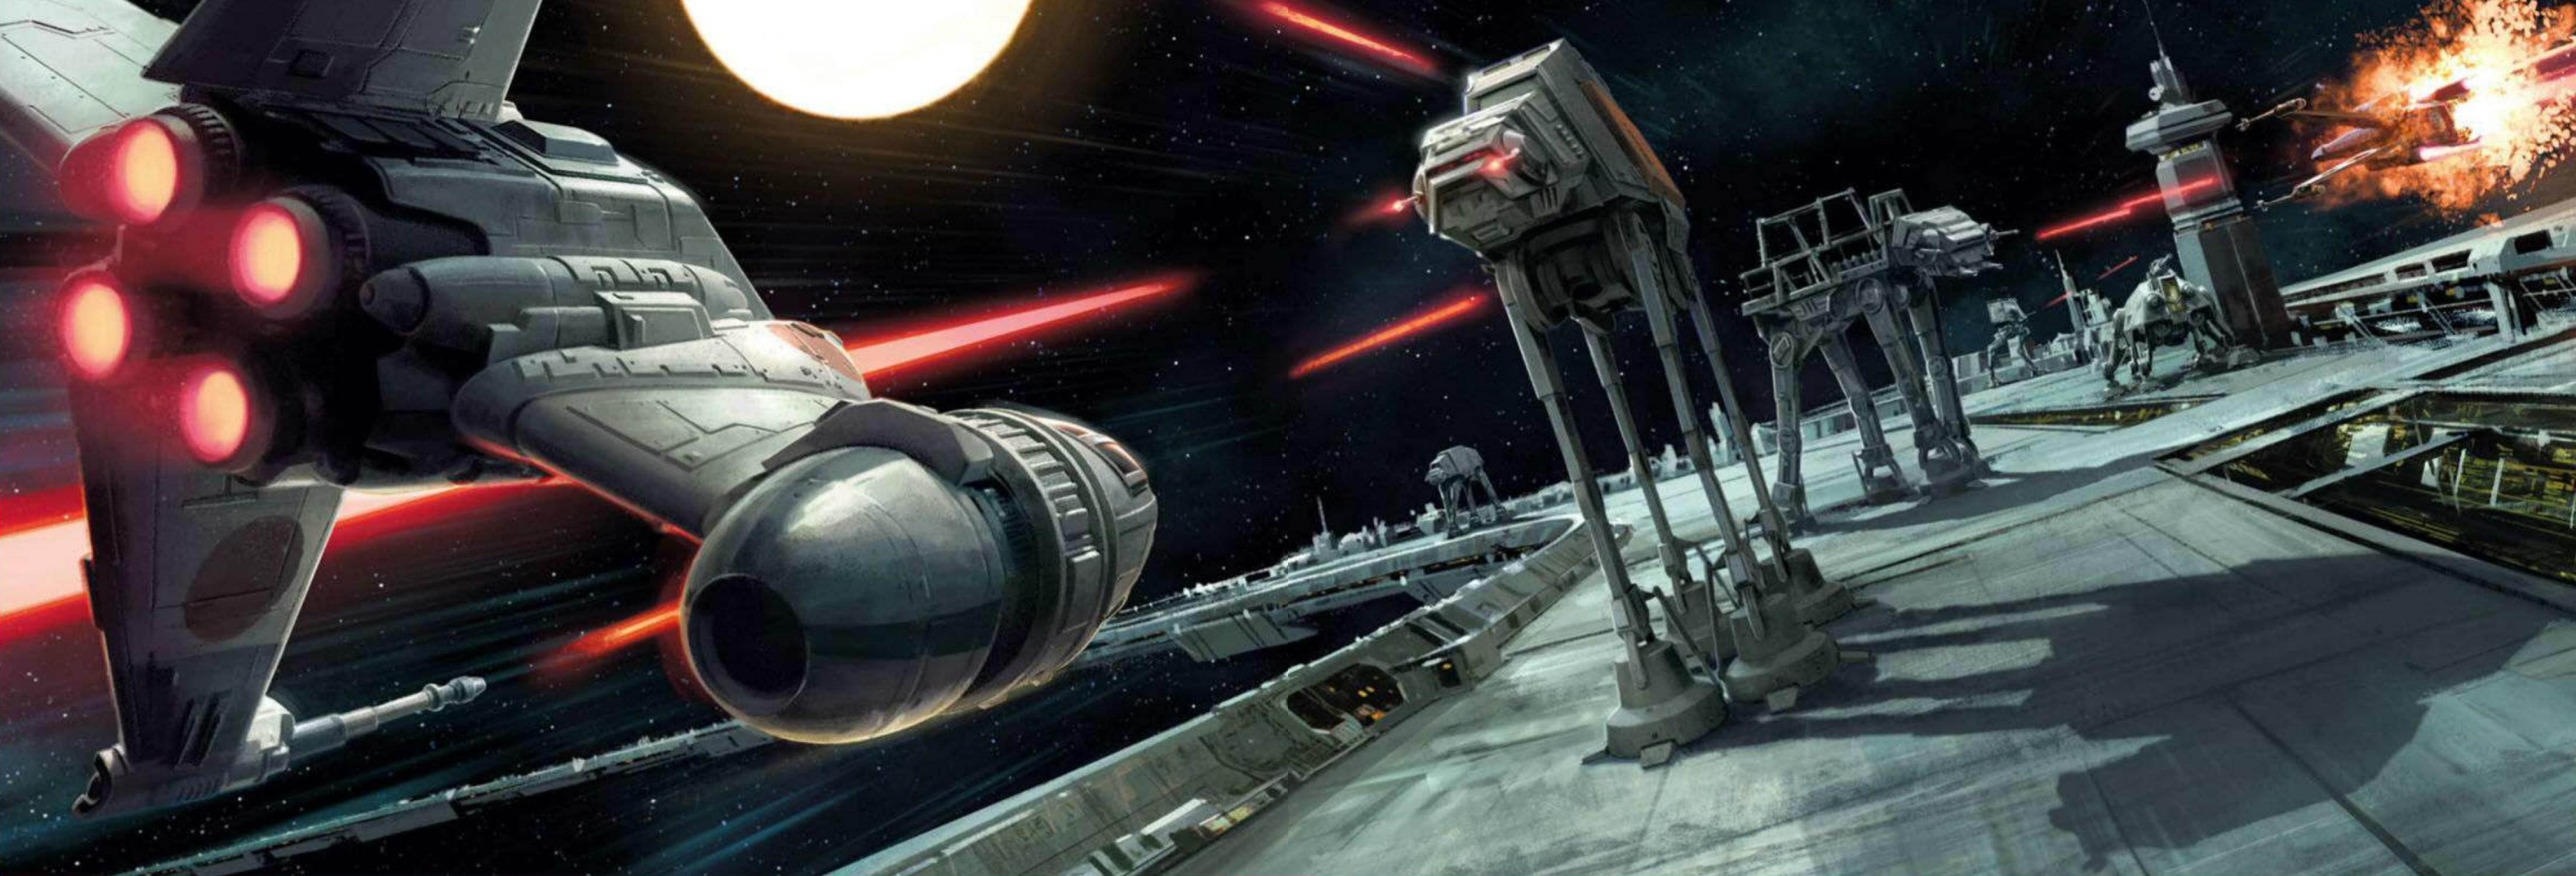 Galactic Civil War   Wookieepedia   FANDOM powered by Wikia